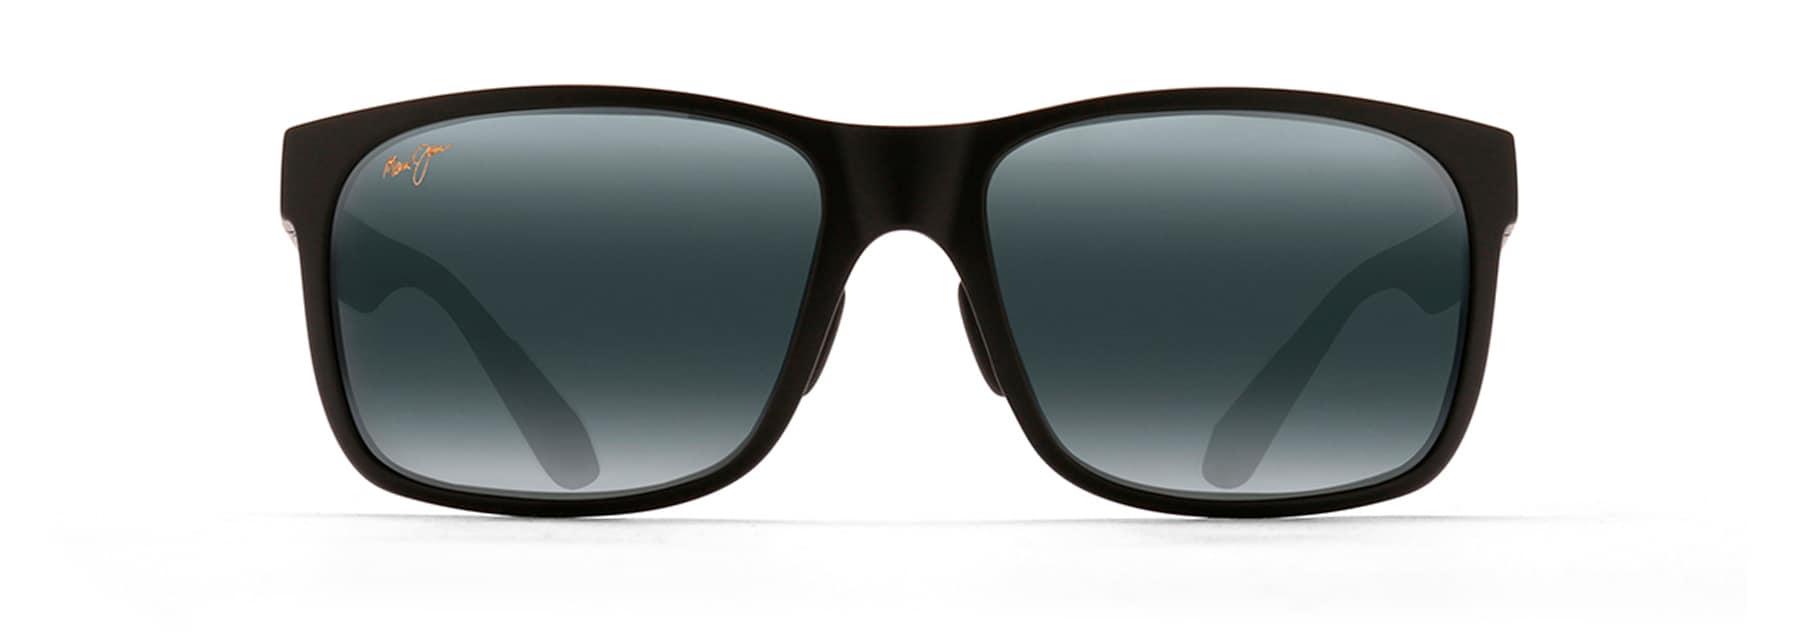 9f4151ff36 Red Sands Polarized Sunglasses | Maui Jim®